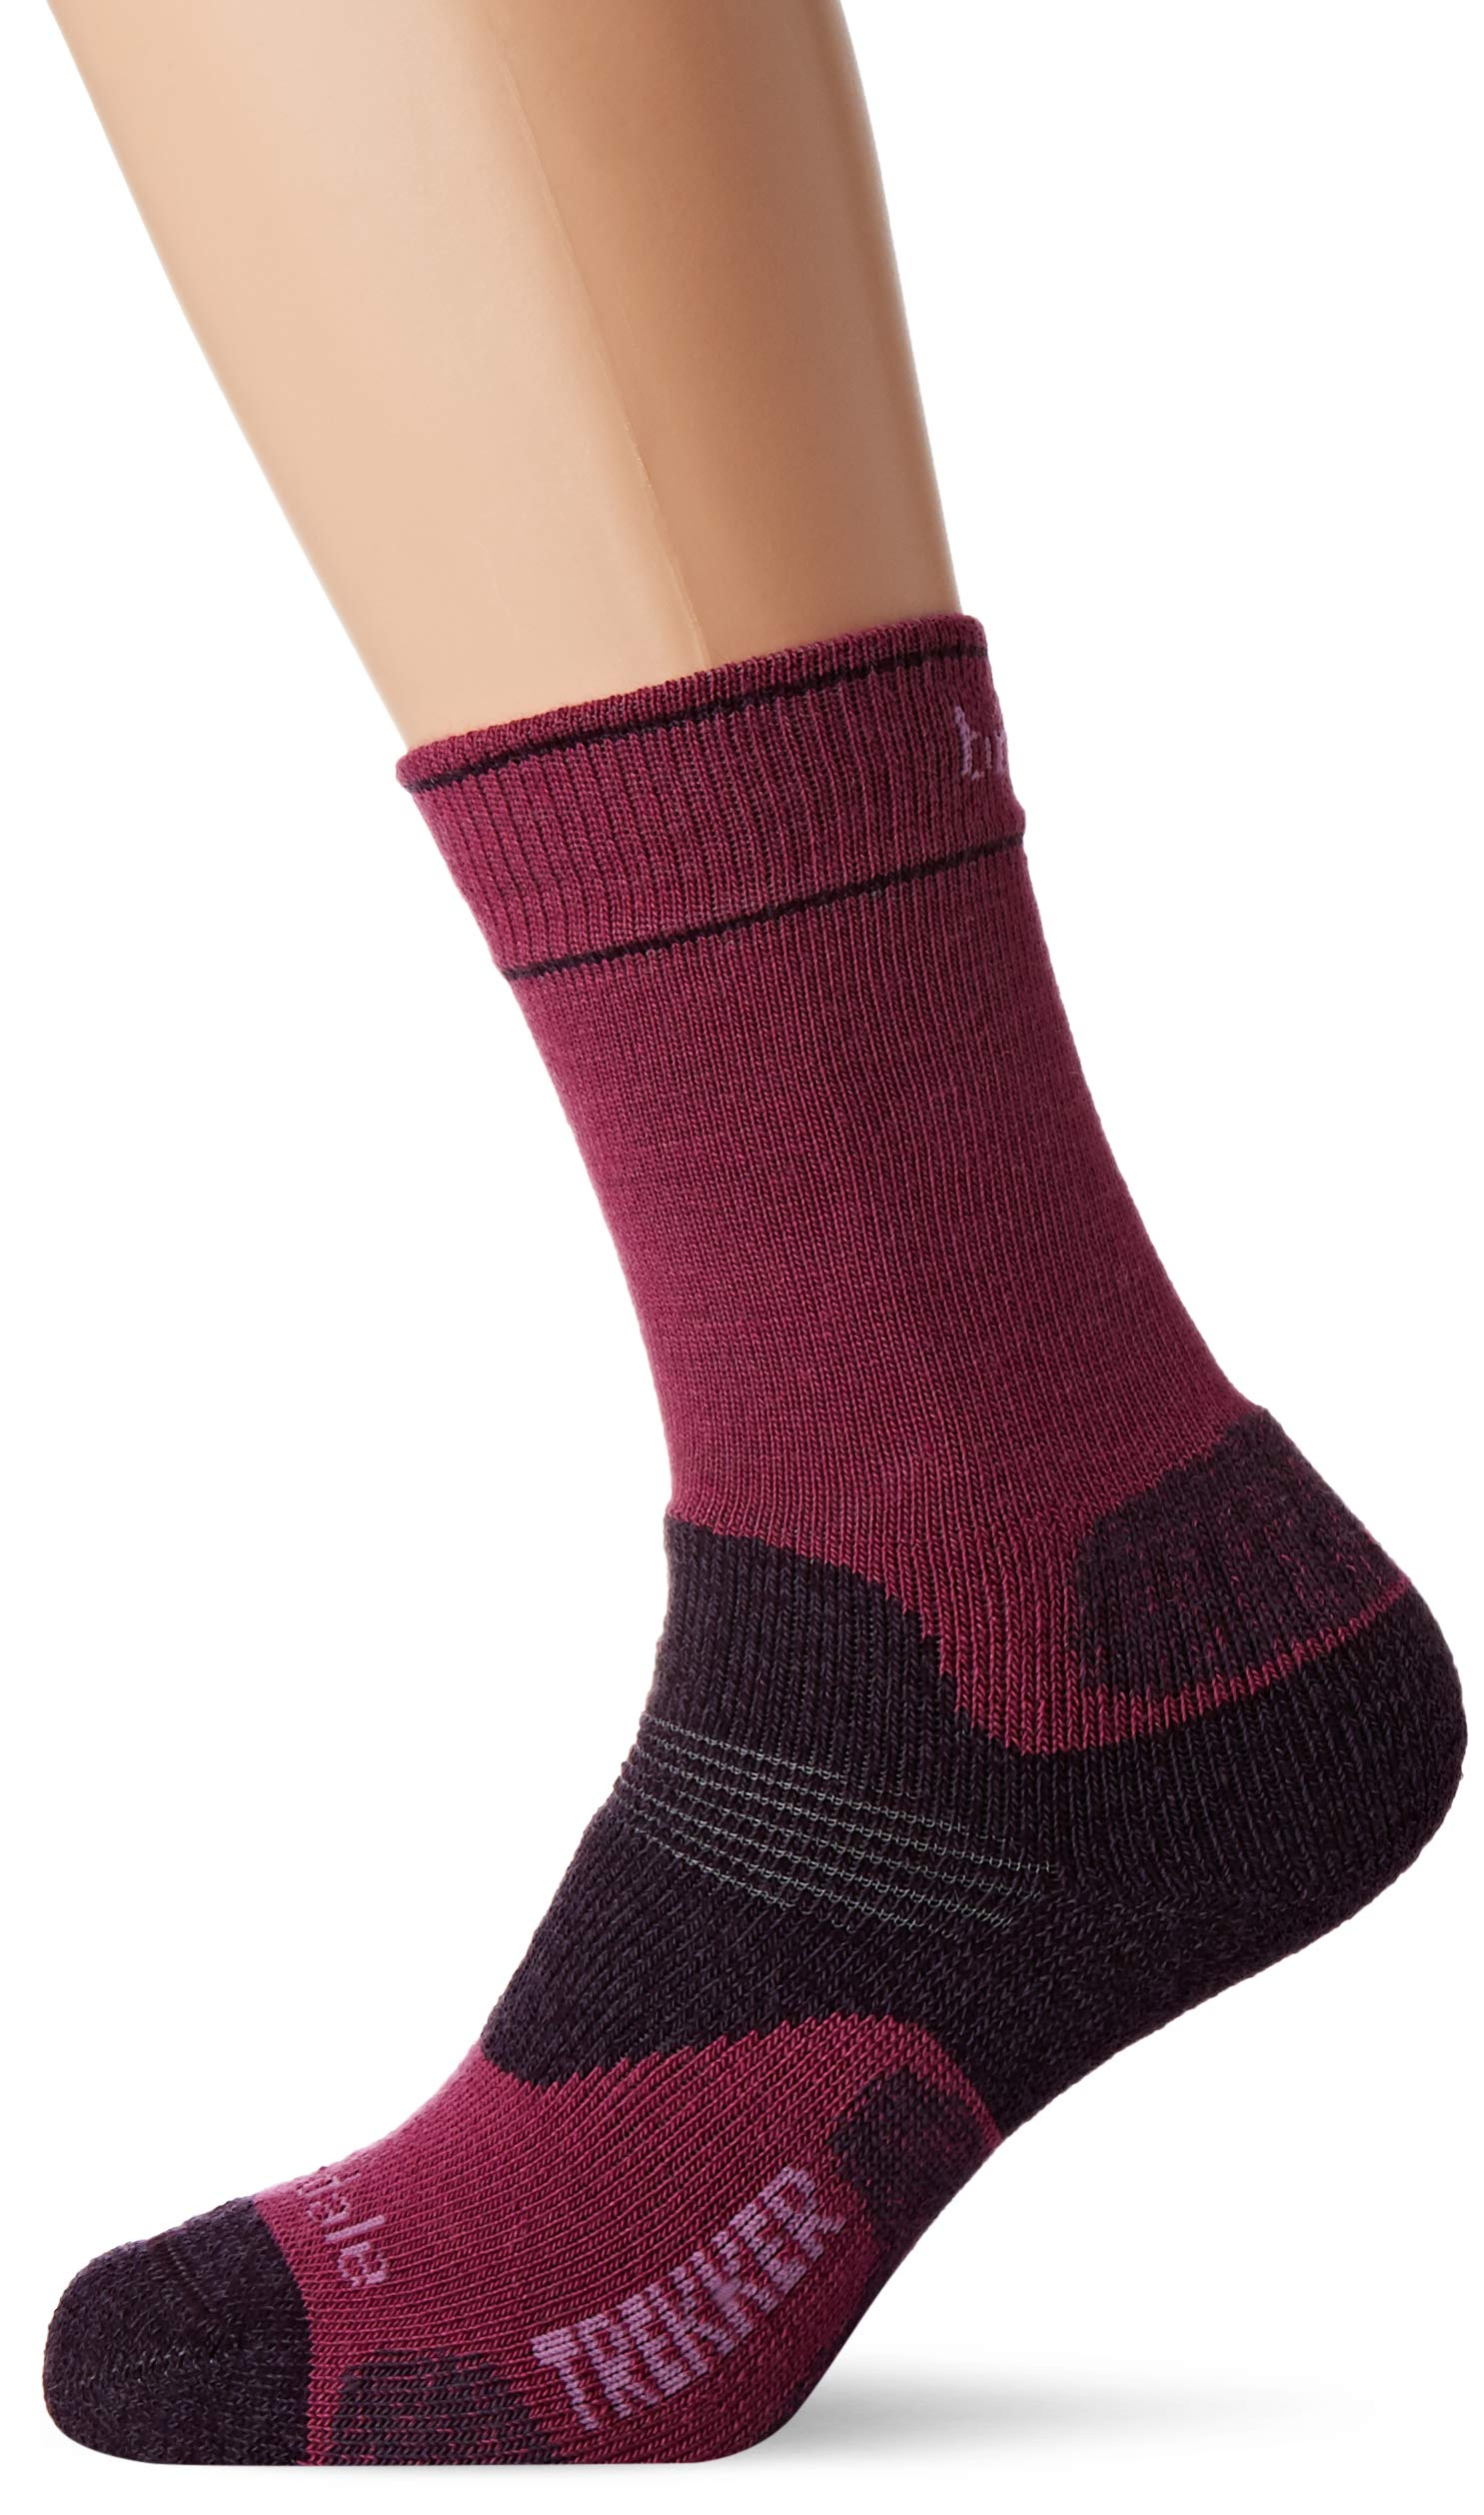 Bridgedale Women's Hike Midweight Merino Endurance Pattern Socks 1